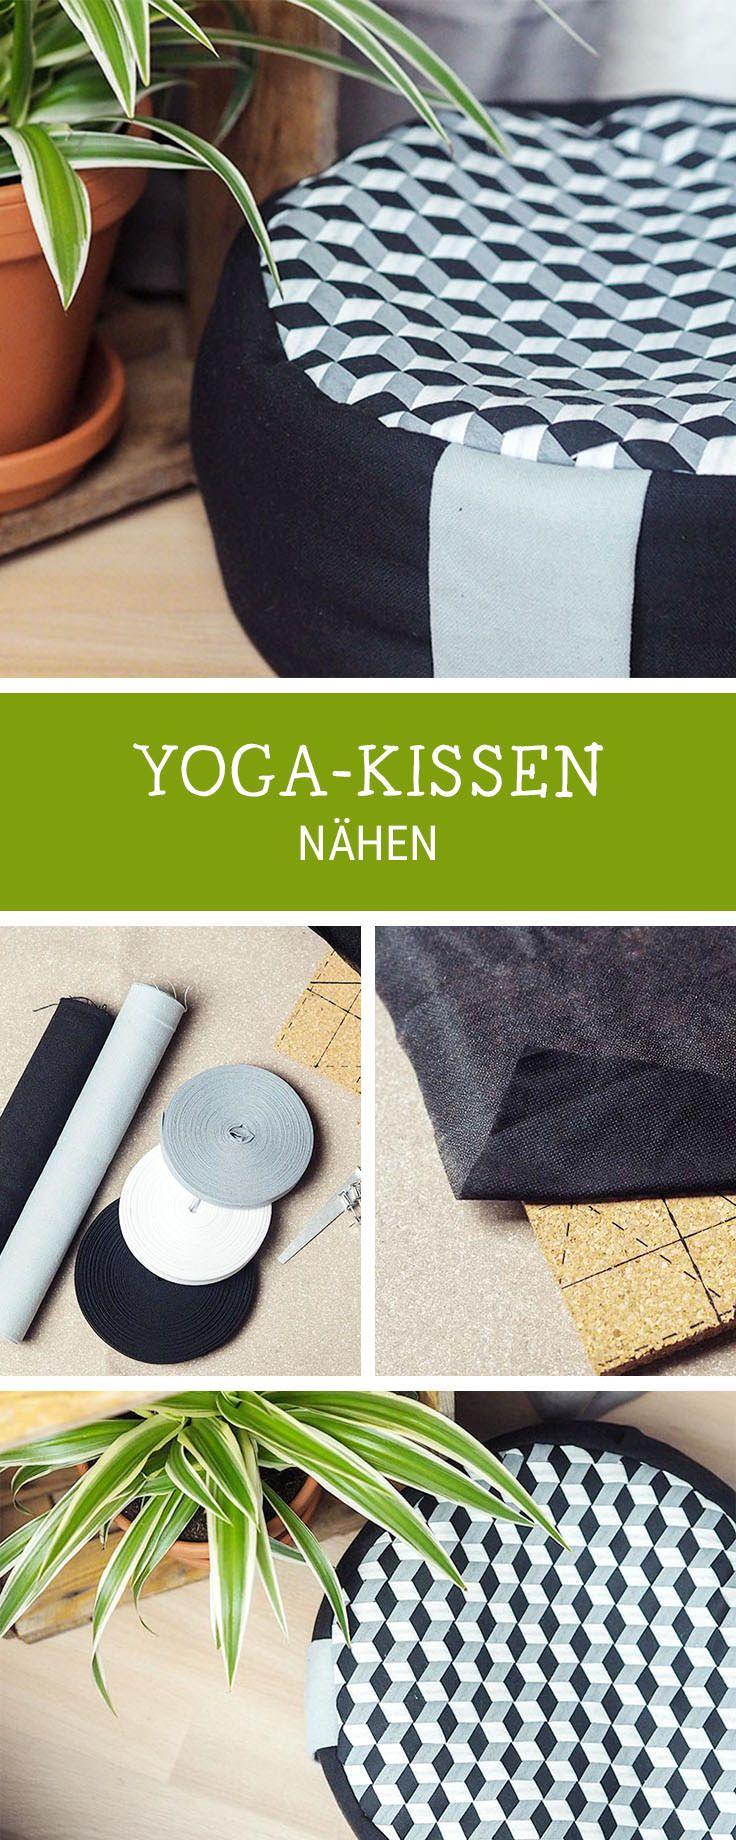 Nähanleitung für ein großes Yogakissen, Geschenkidee für Yogis, Schnittmuster / sewing pattern for a yoga cushion, handmade giftidea for yogis via DaWanda.com